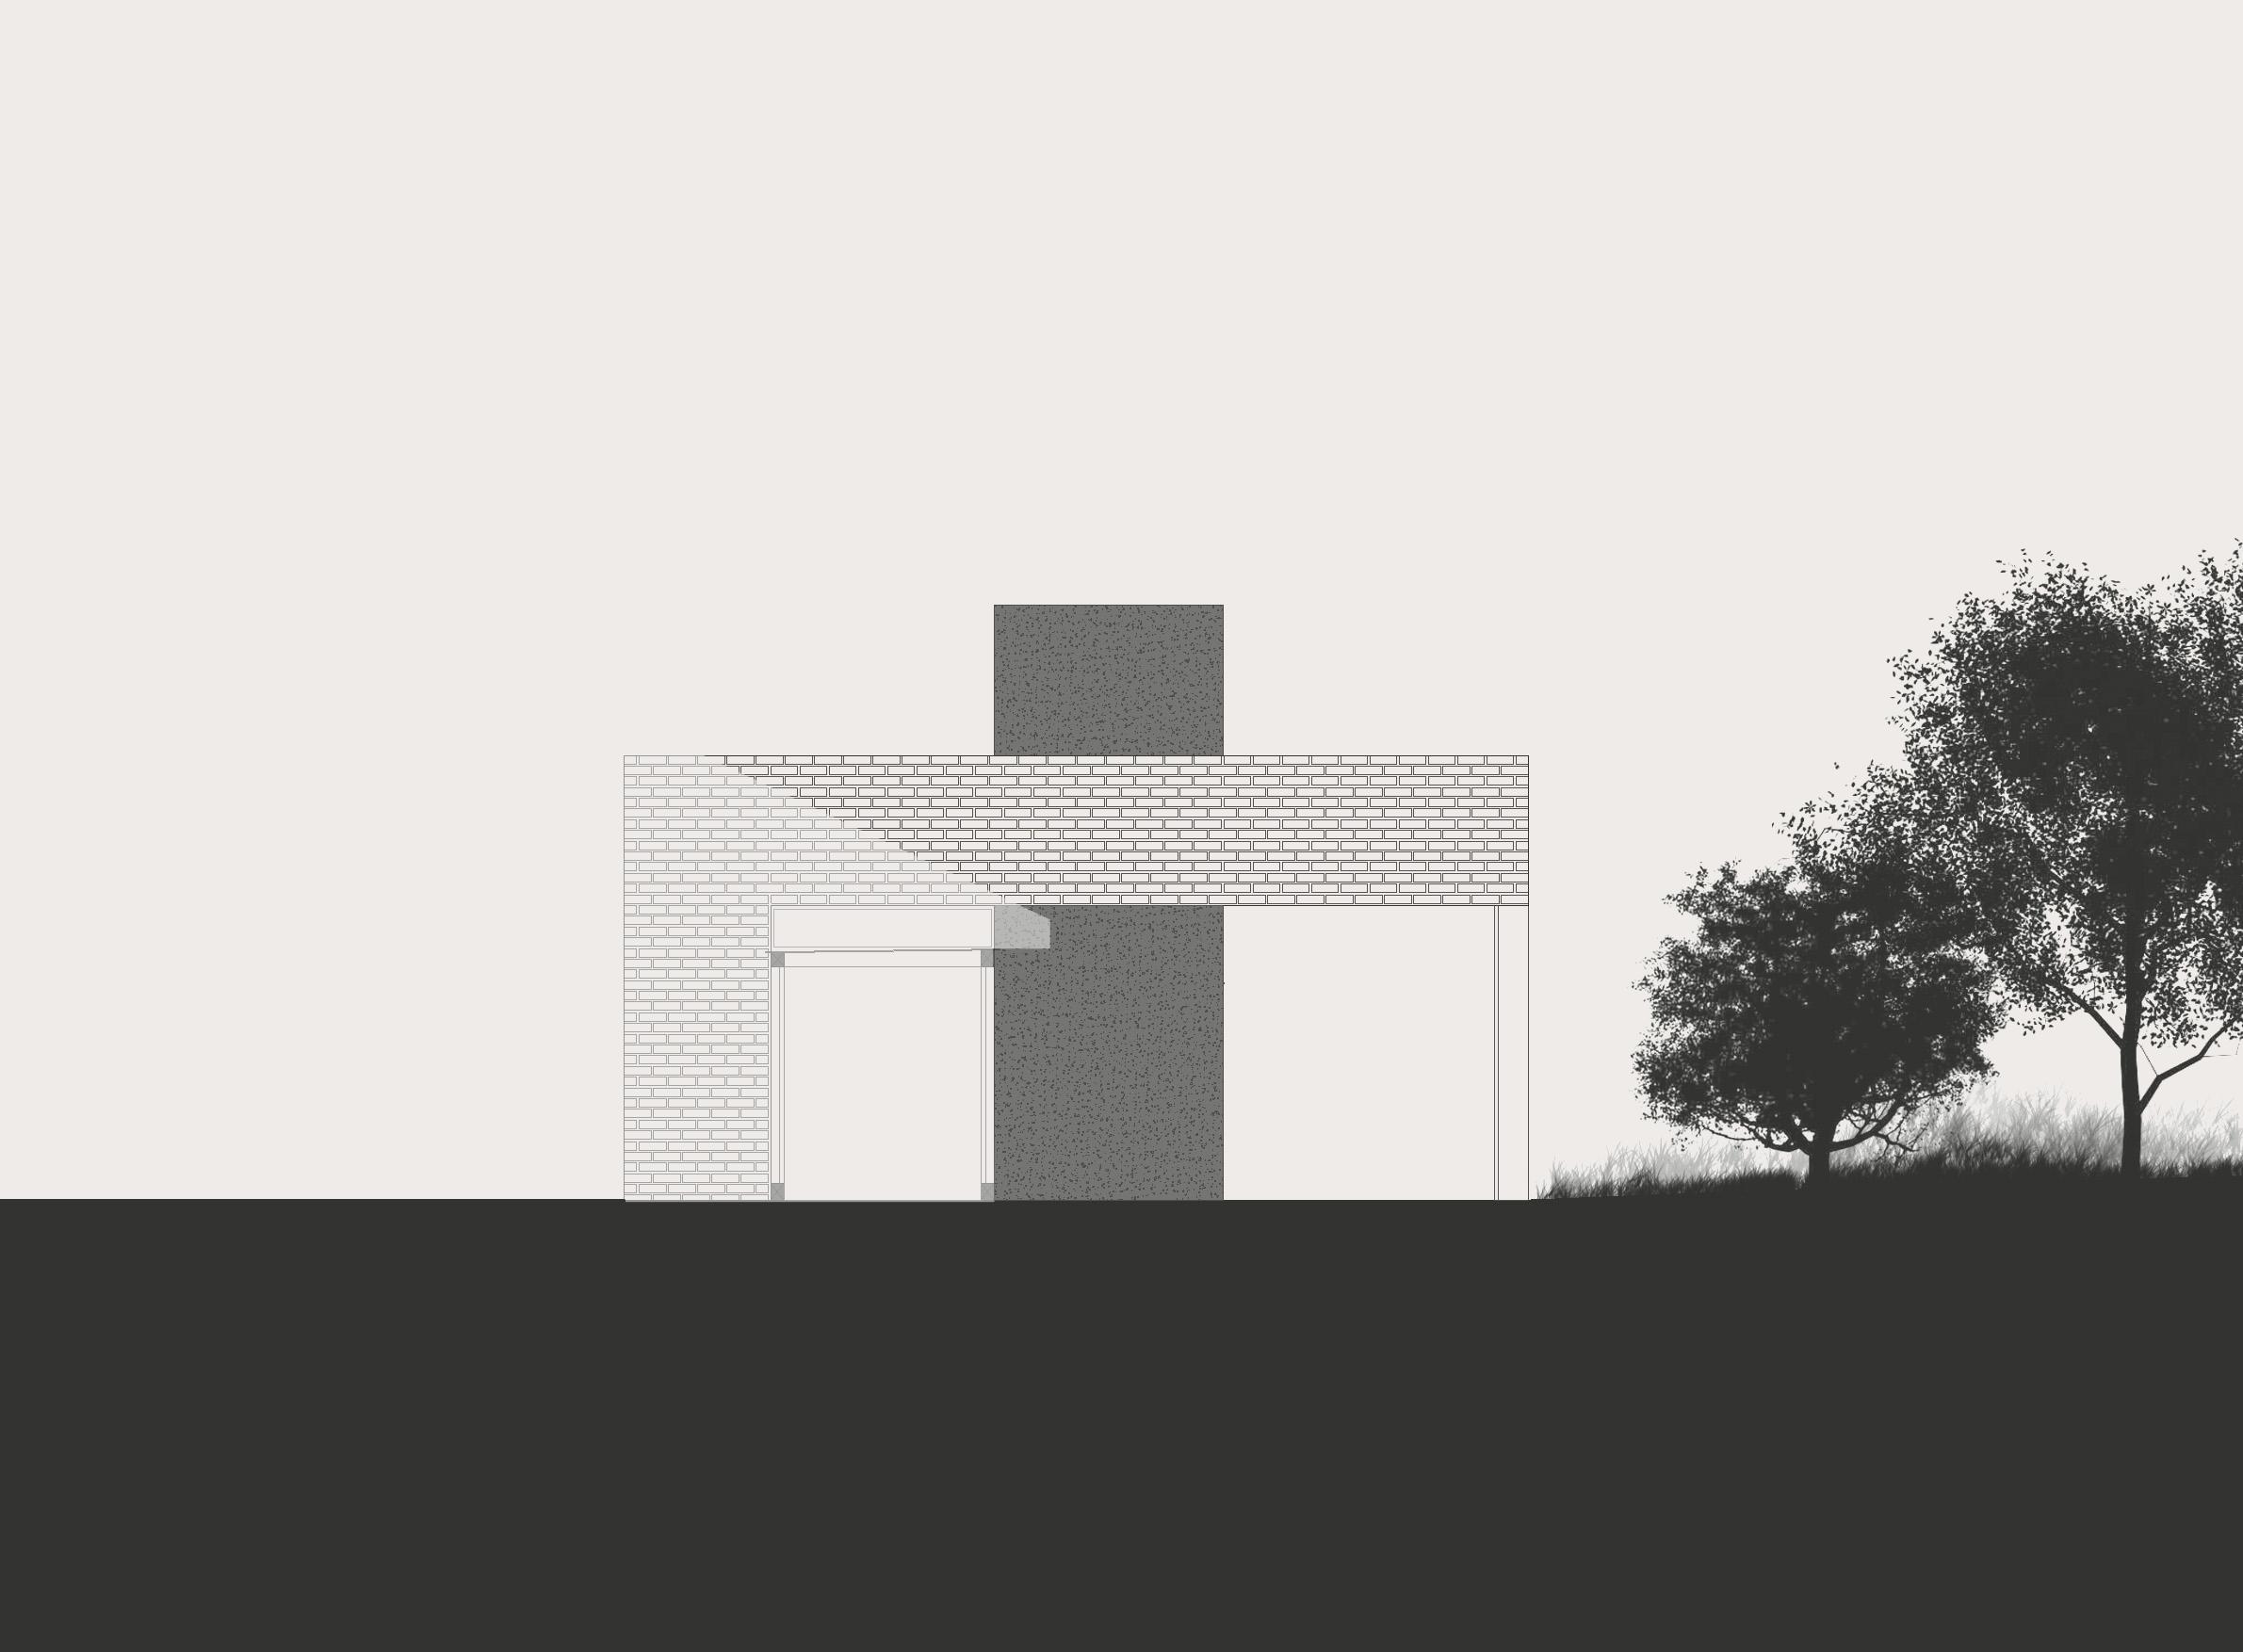 subachoque-plano-4.jpg